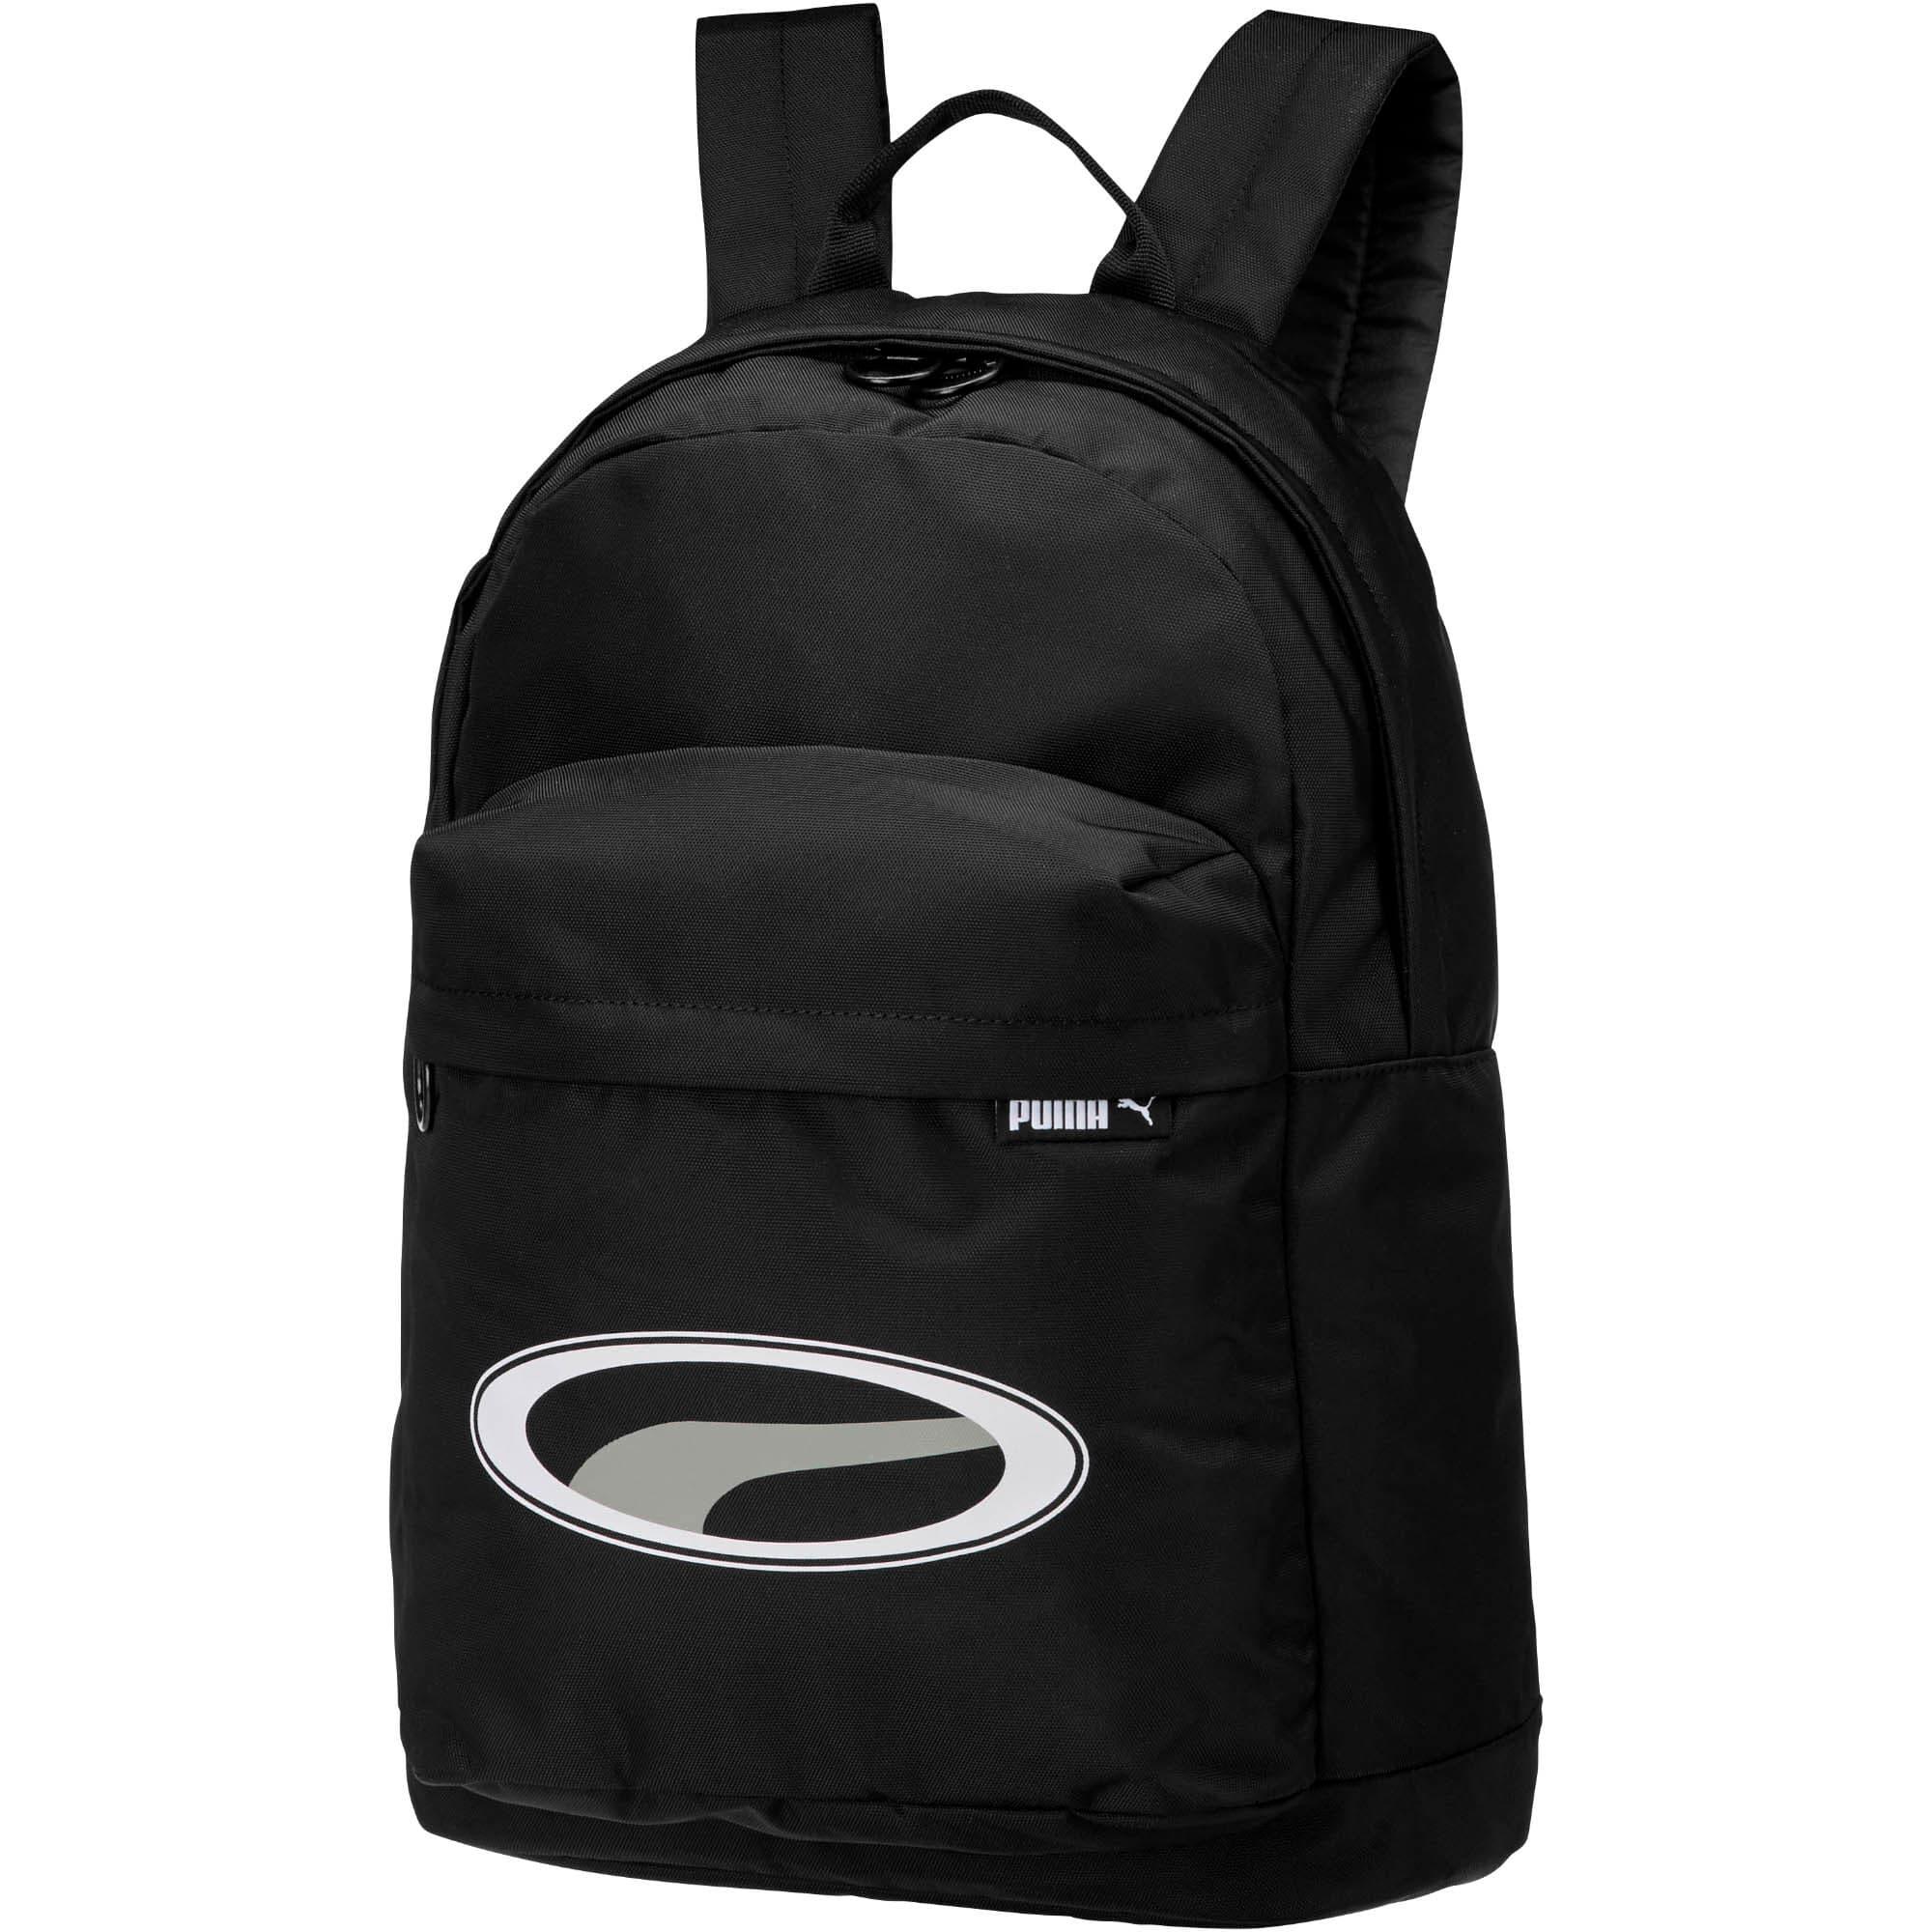 Thumbnail 1 of Originals CELL Backpack, Puma Black-Cell OG SL9, medium